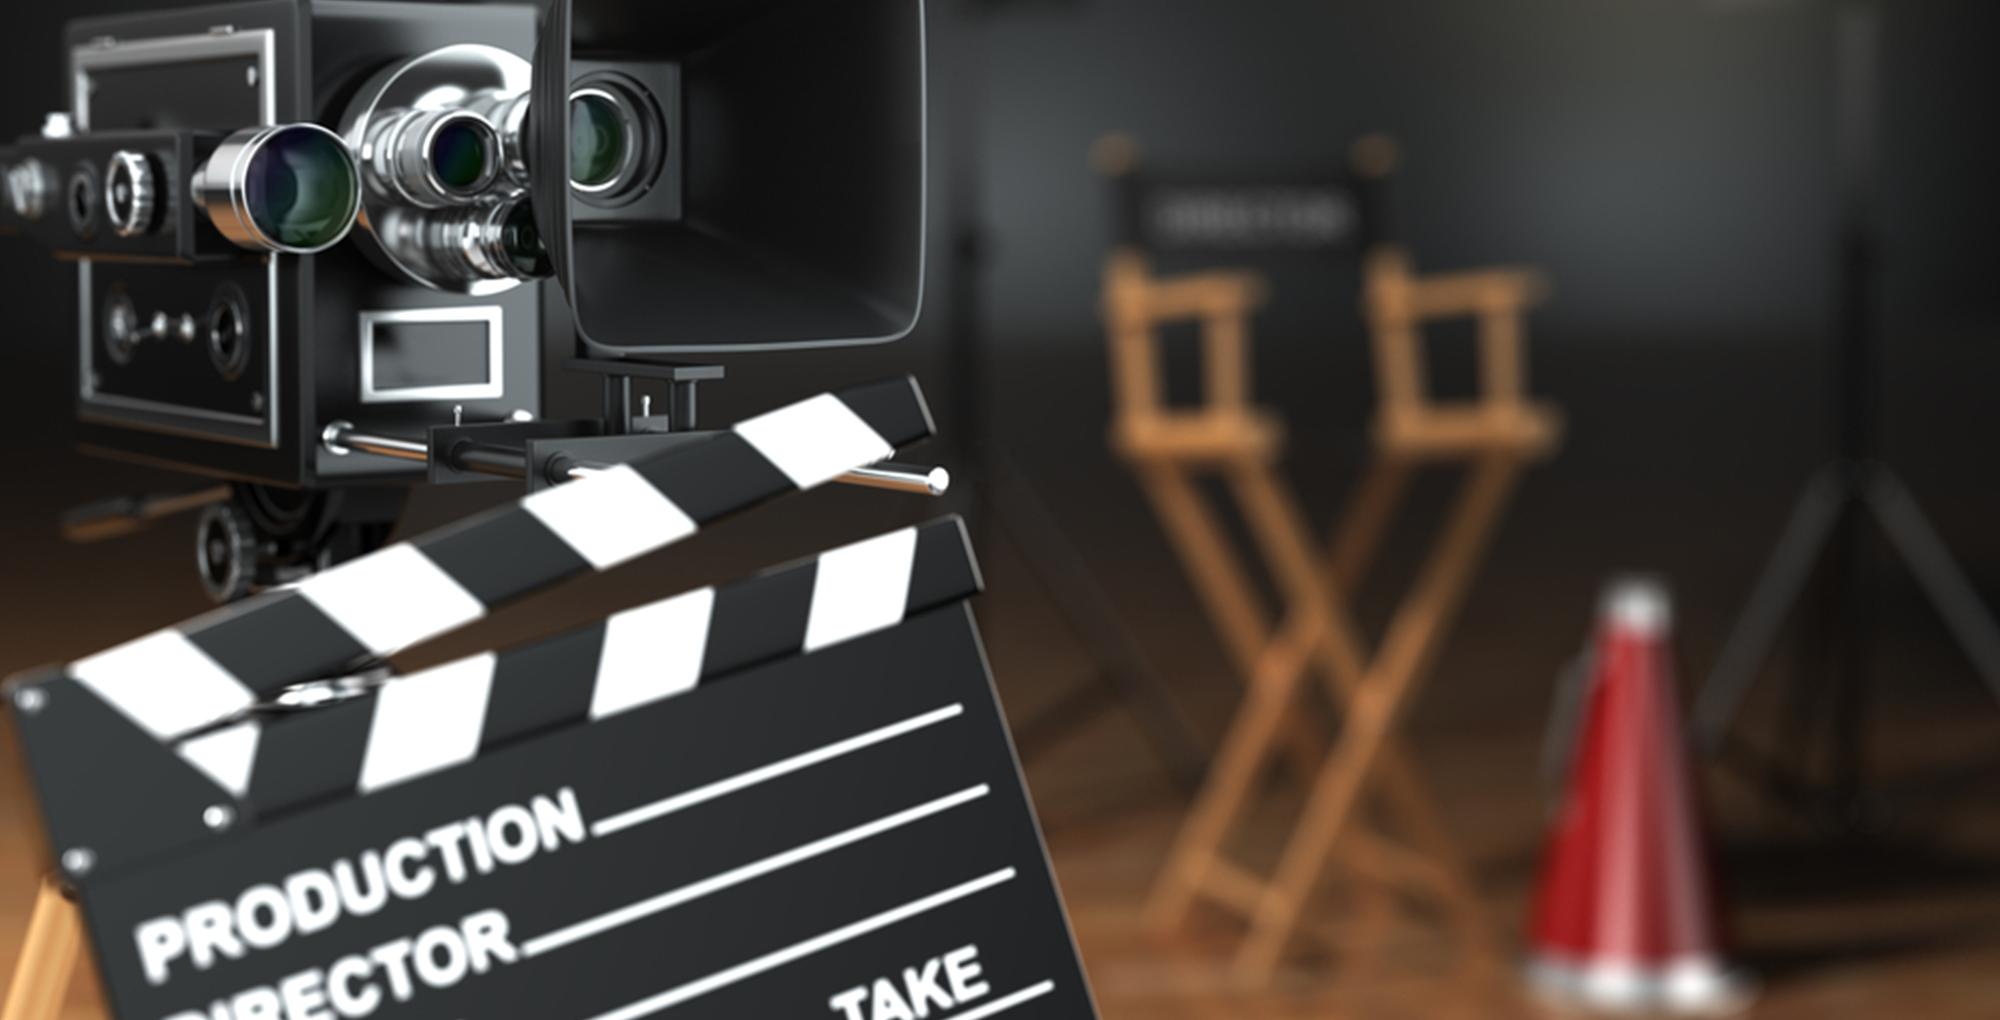 Media and creatives